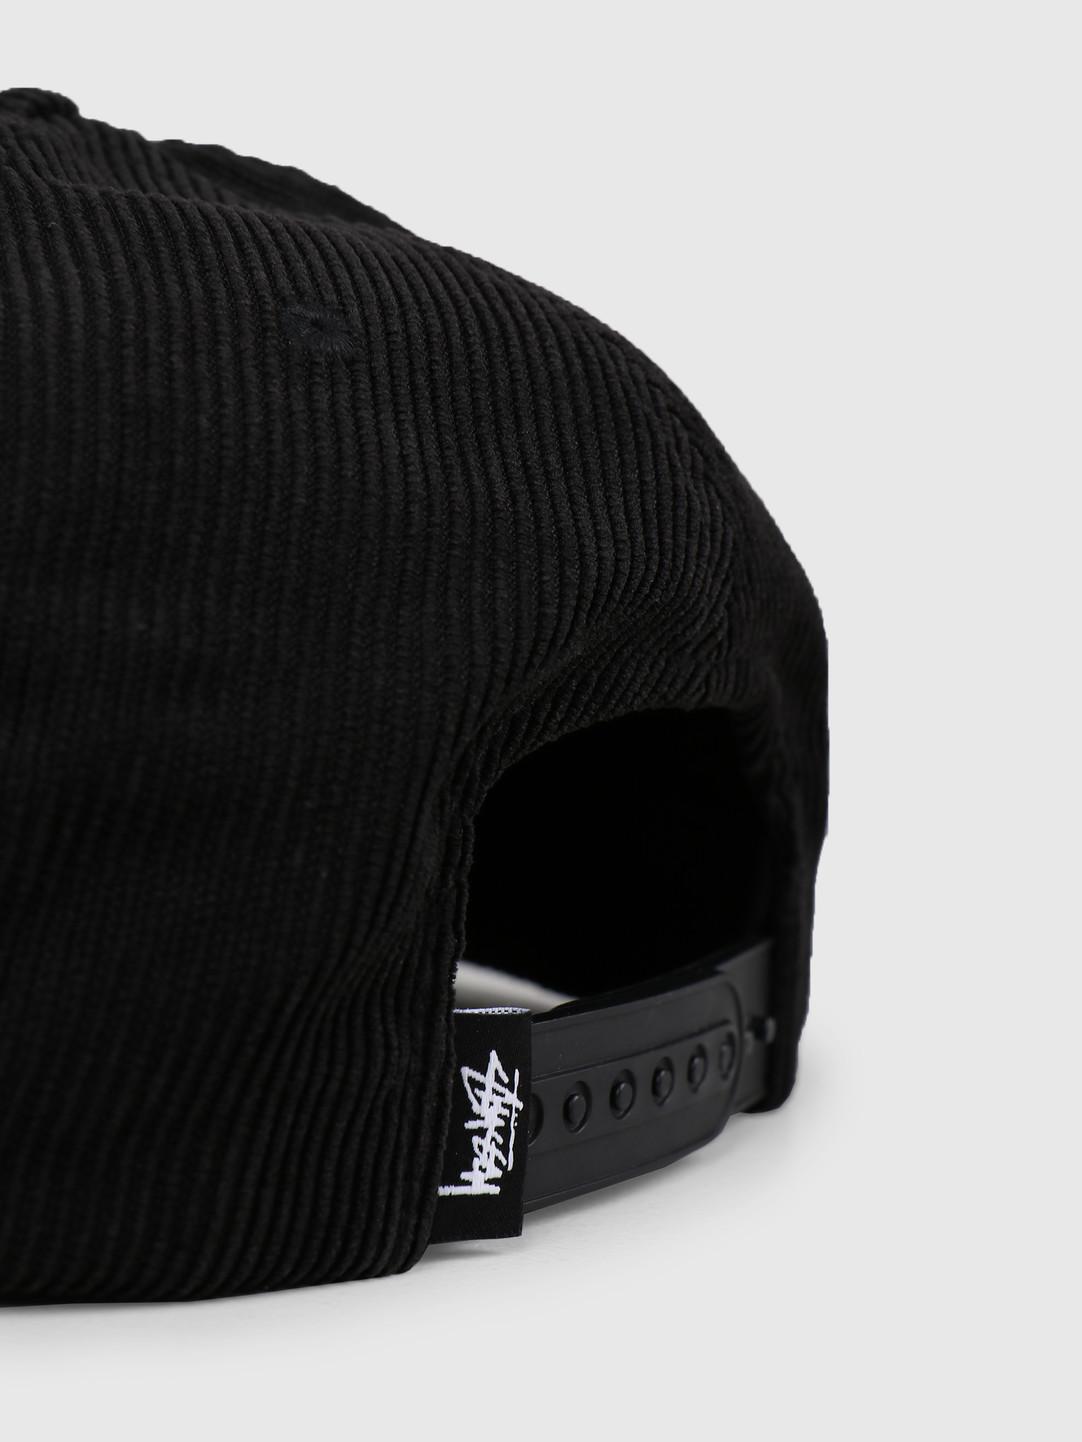 Stussy Stussy Washed Cord Cap Black 0001